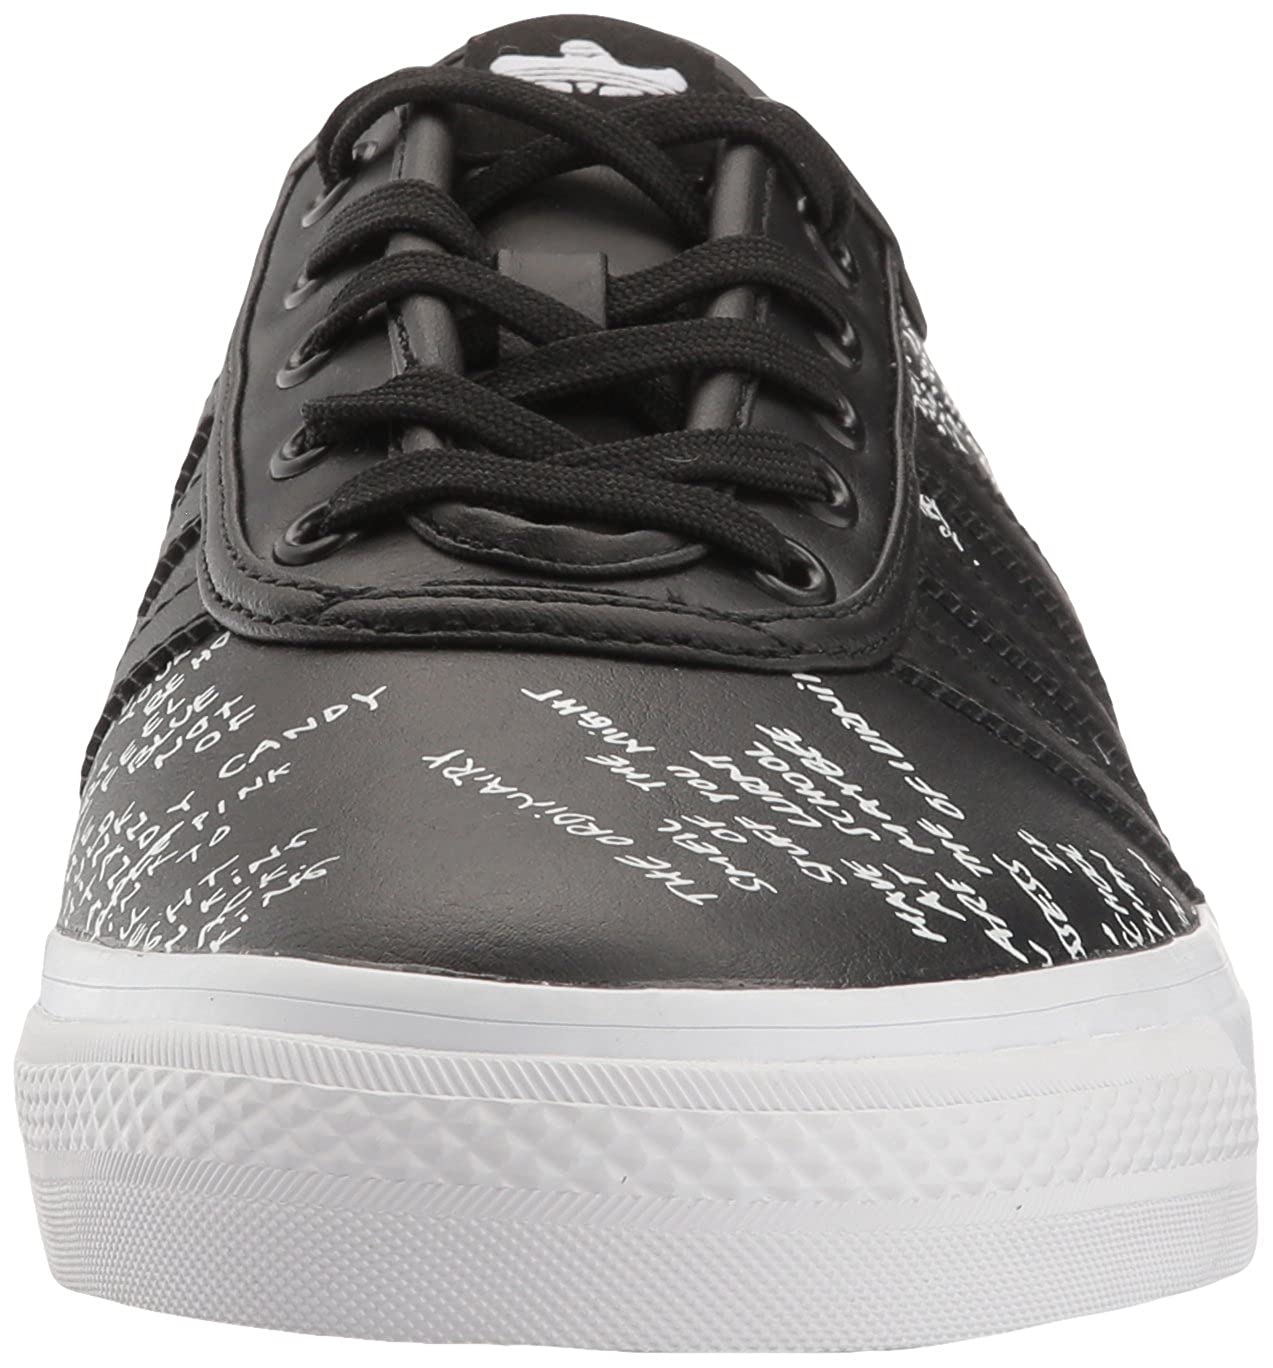 reputable site a38e6 2de1f adidas Originals Men s Adi-Ease Classified Fashion Sneaker  Amazon.co.uk   Shoes   Bags